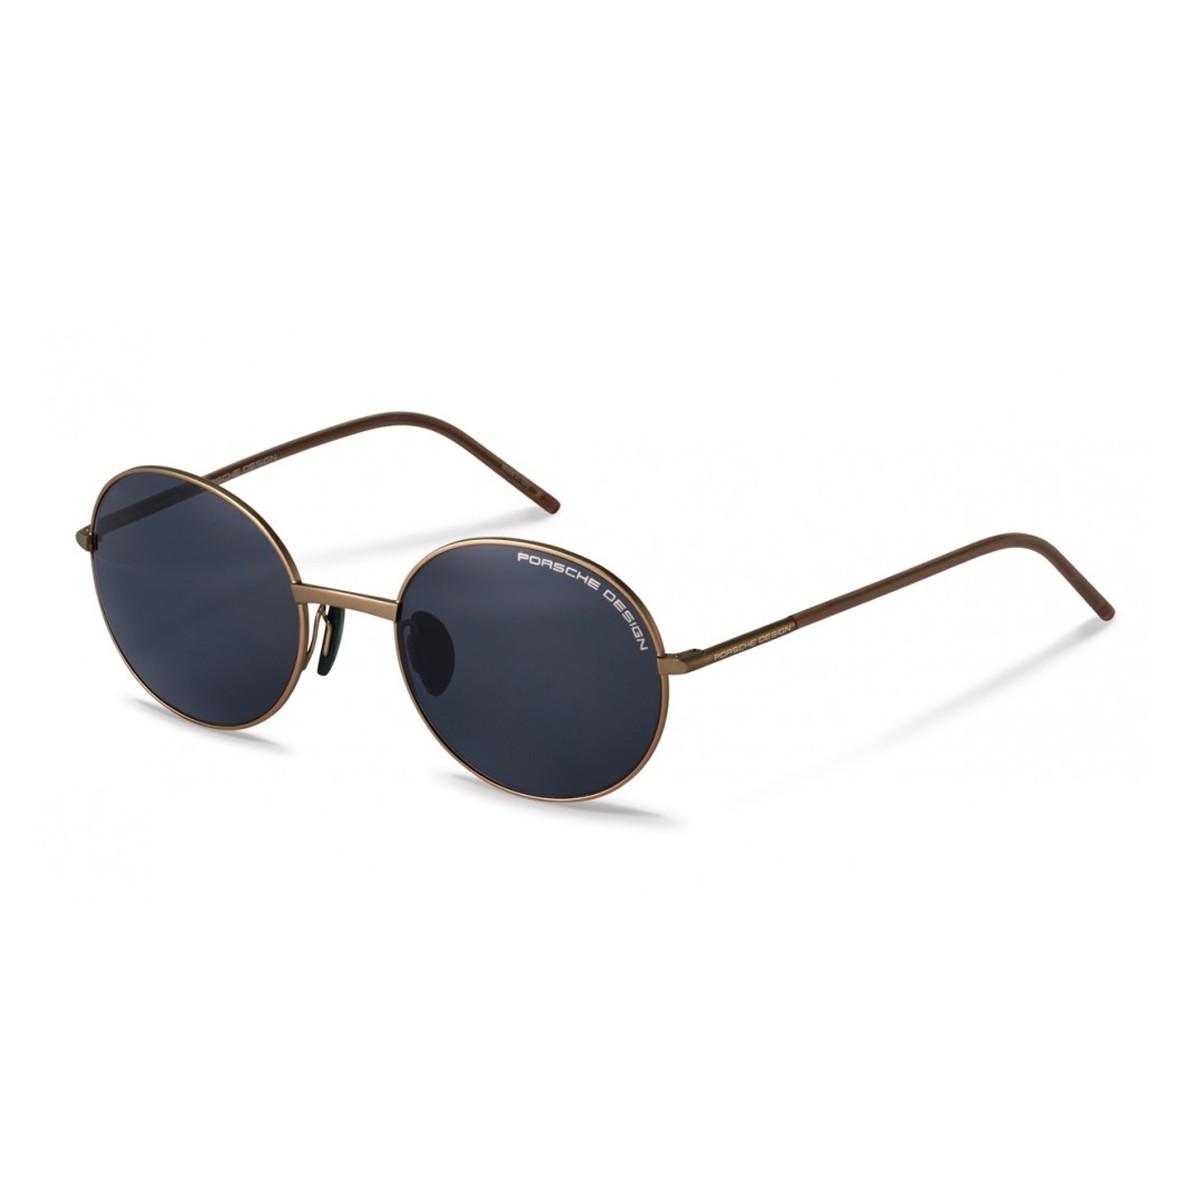 Porsche Design P8631 | Men's sunglasses